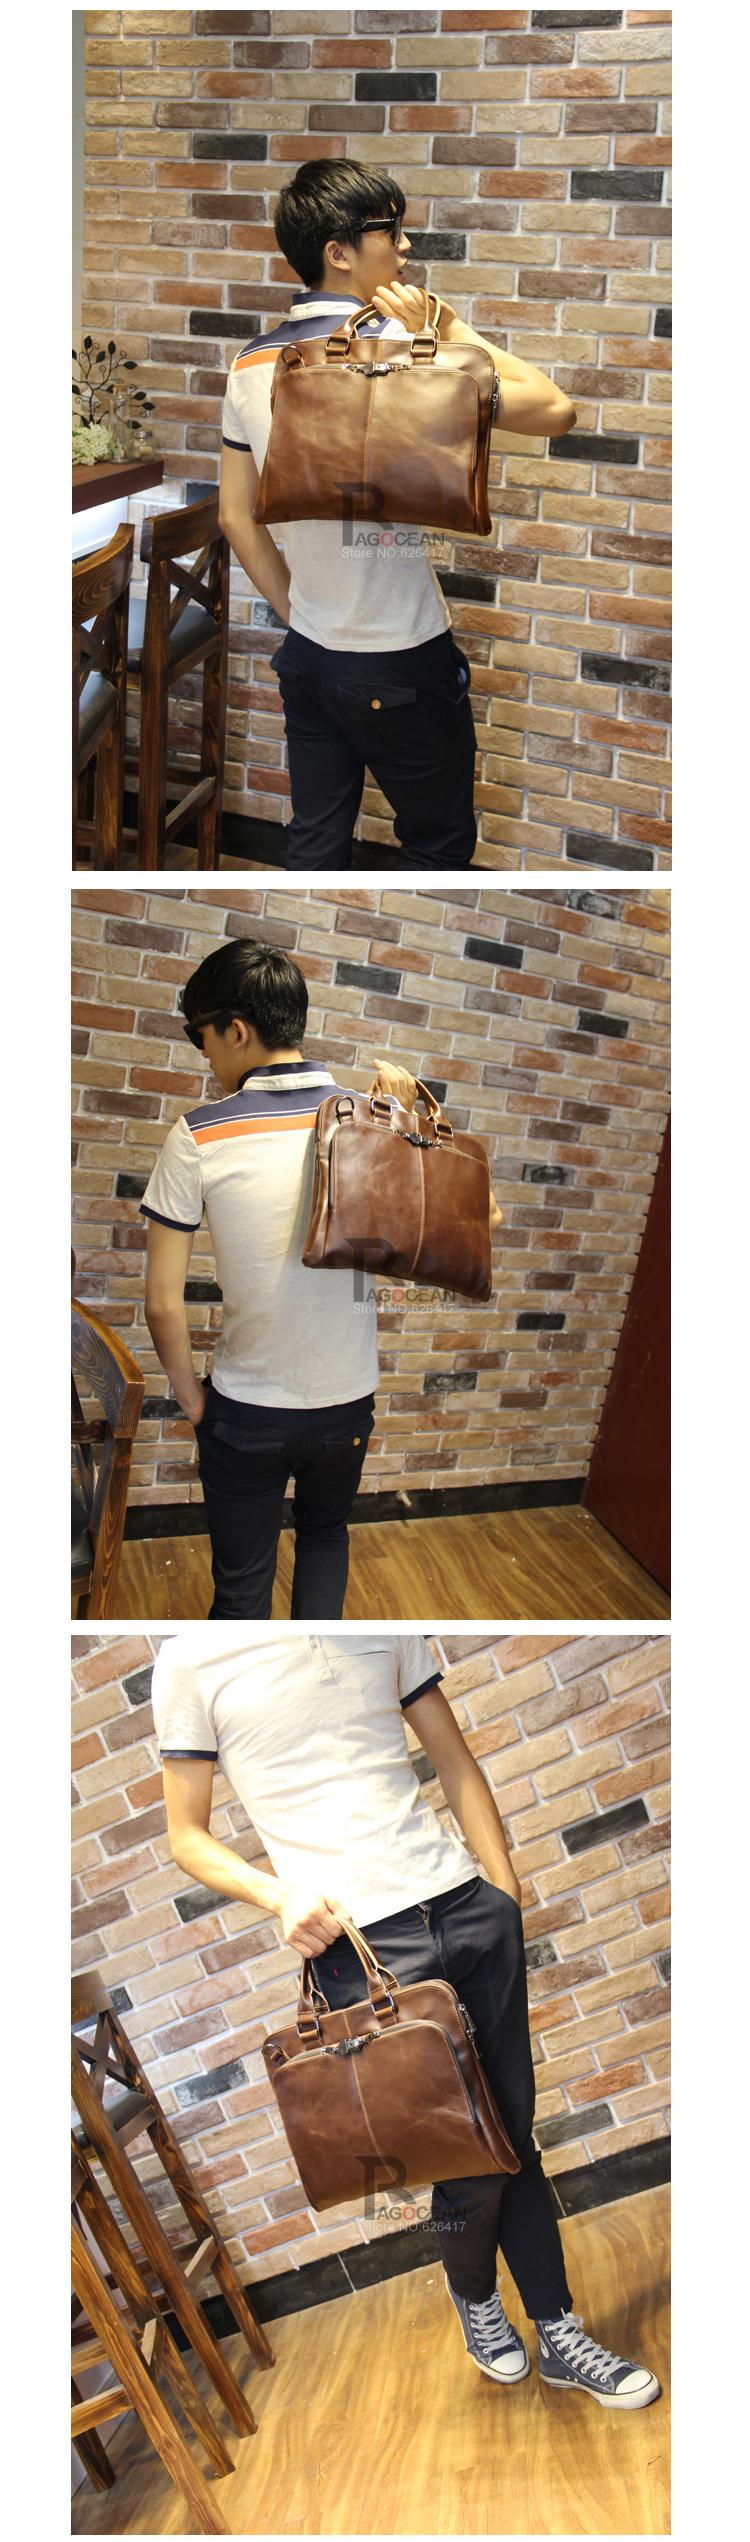 "New high quality pu leather Shoulder leisure men's bag business messenger portable briefcase Laptop large Purse 14"" Handbag 8"